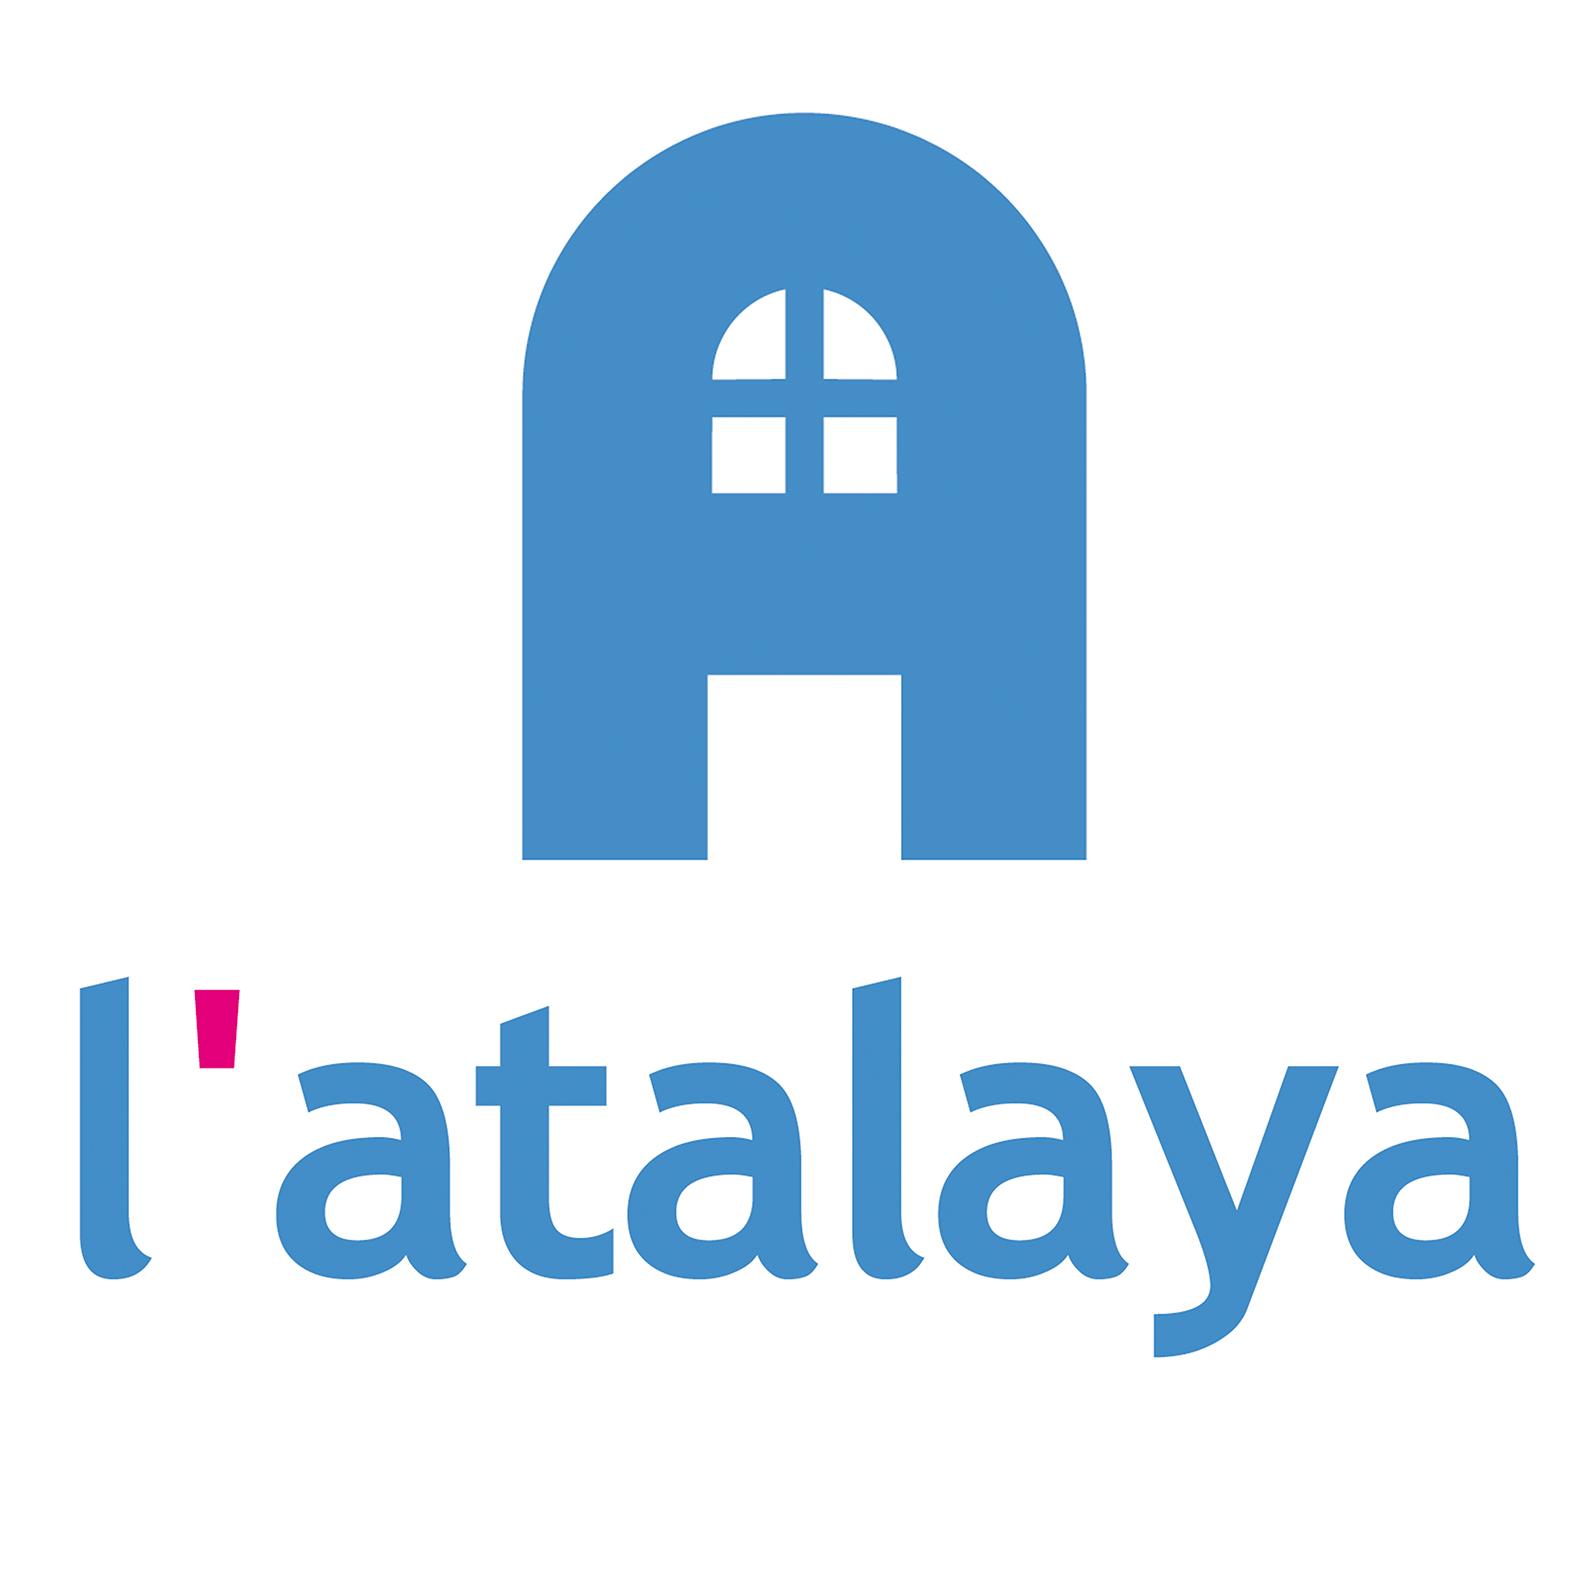 Pvc L'Atalaya